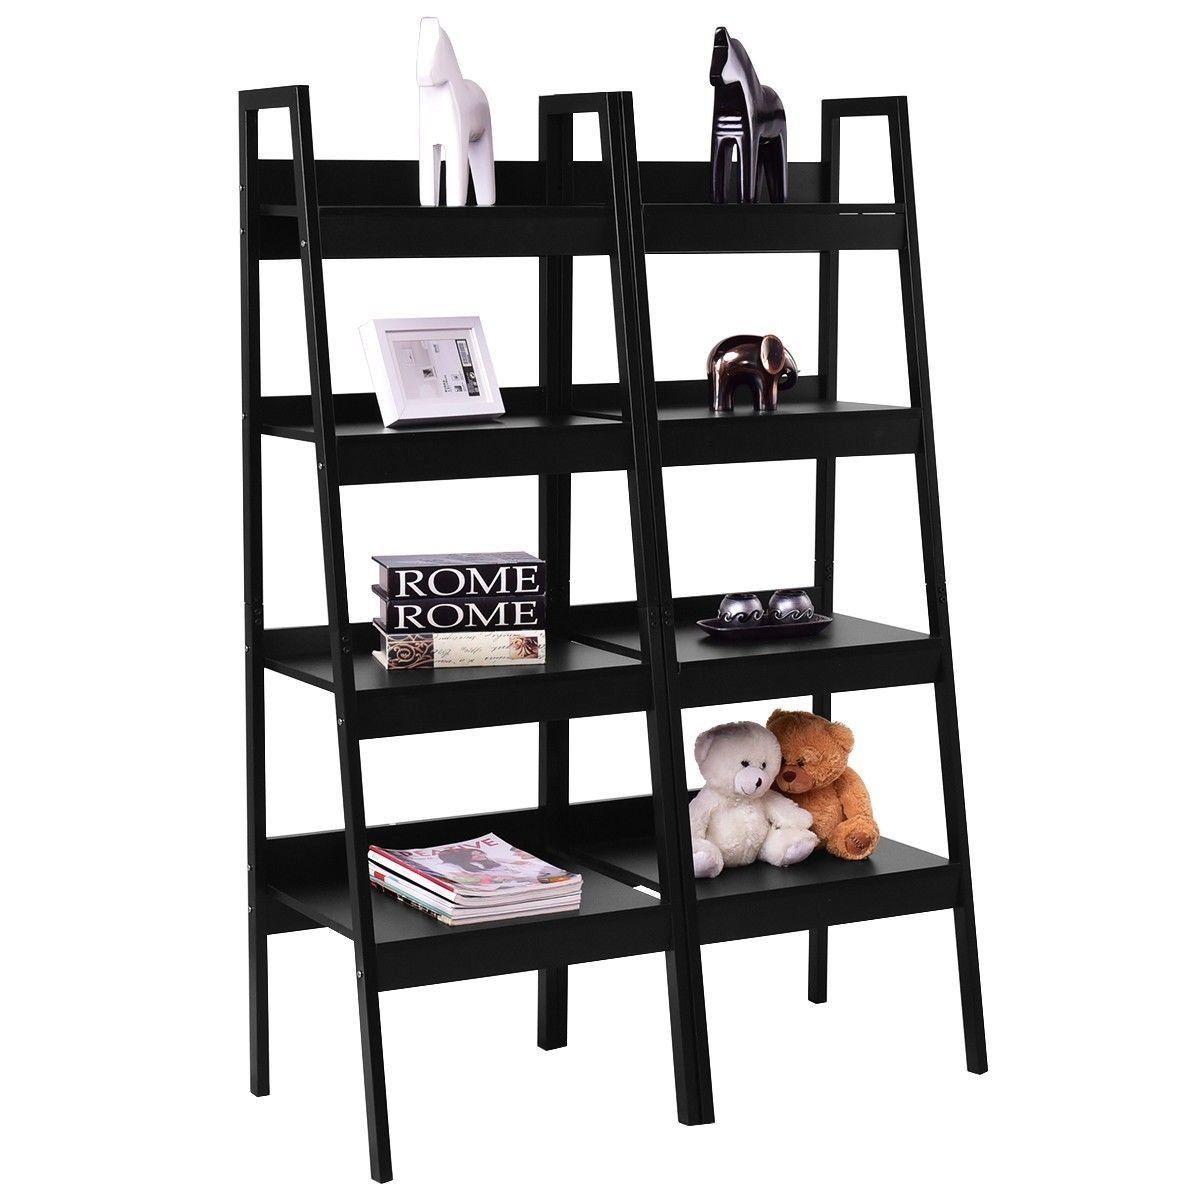 Set of classic black ladder style display shelf shelves media